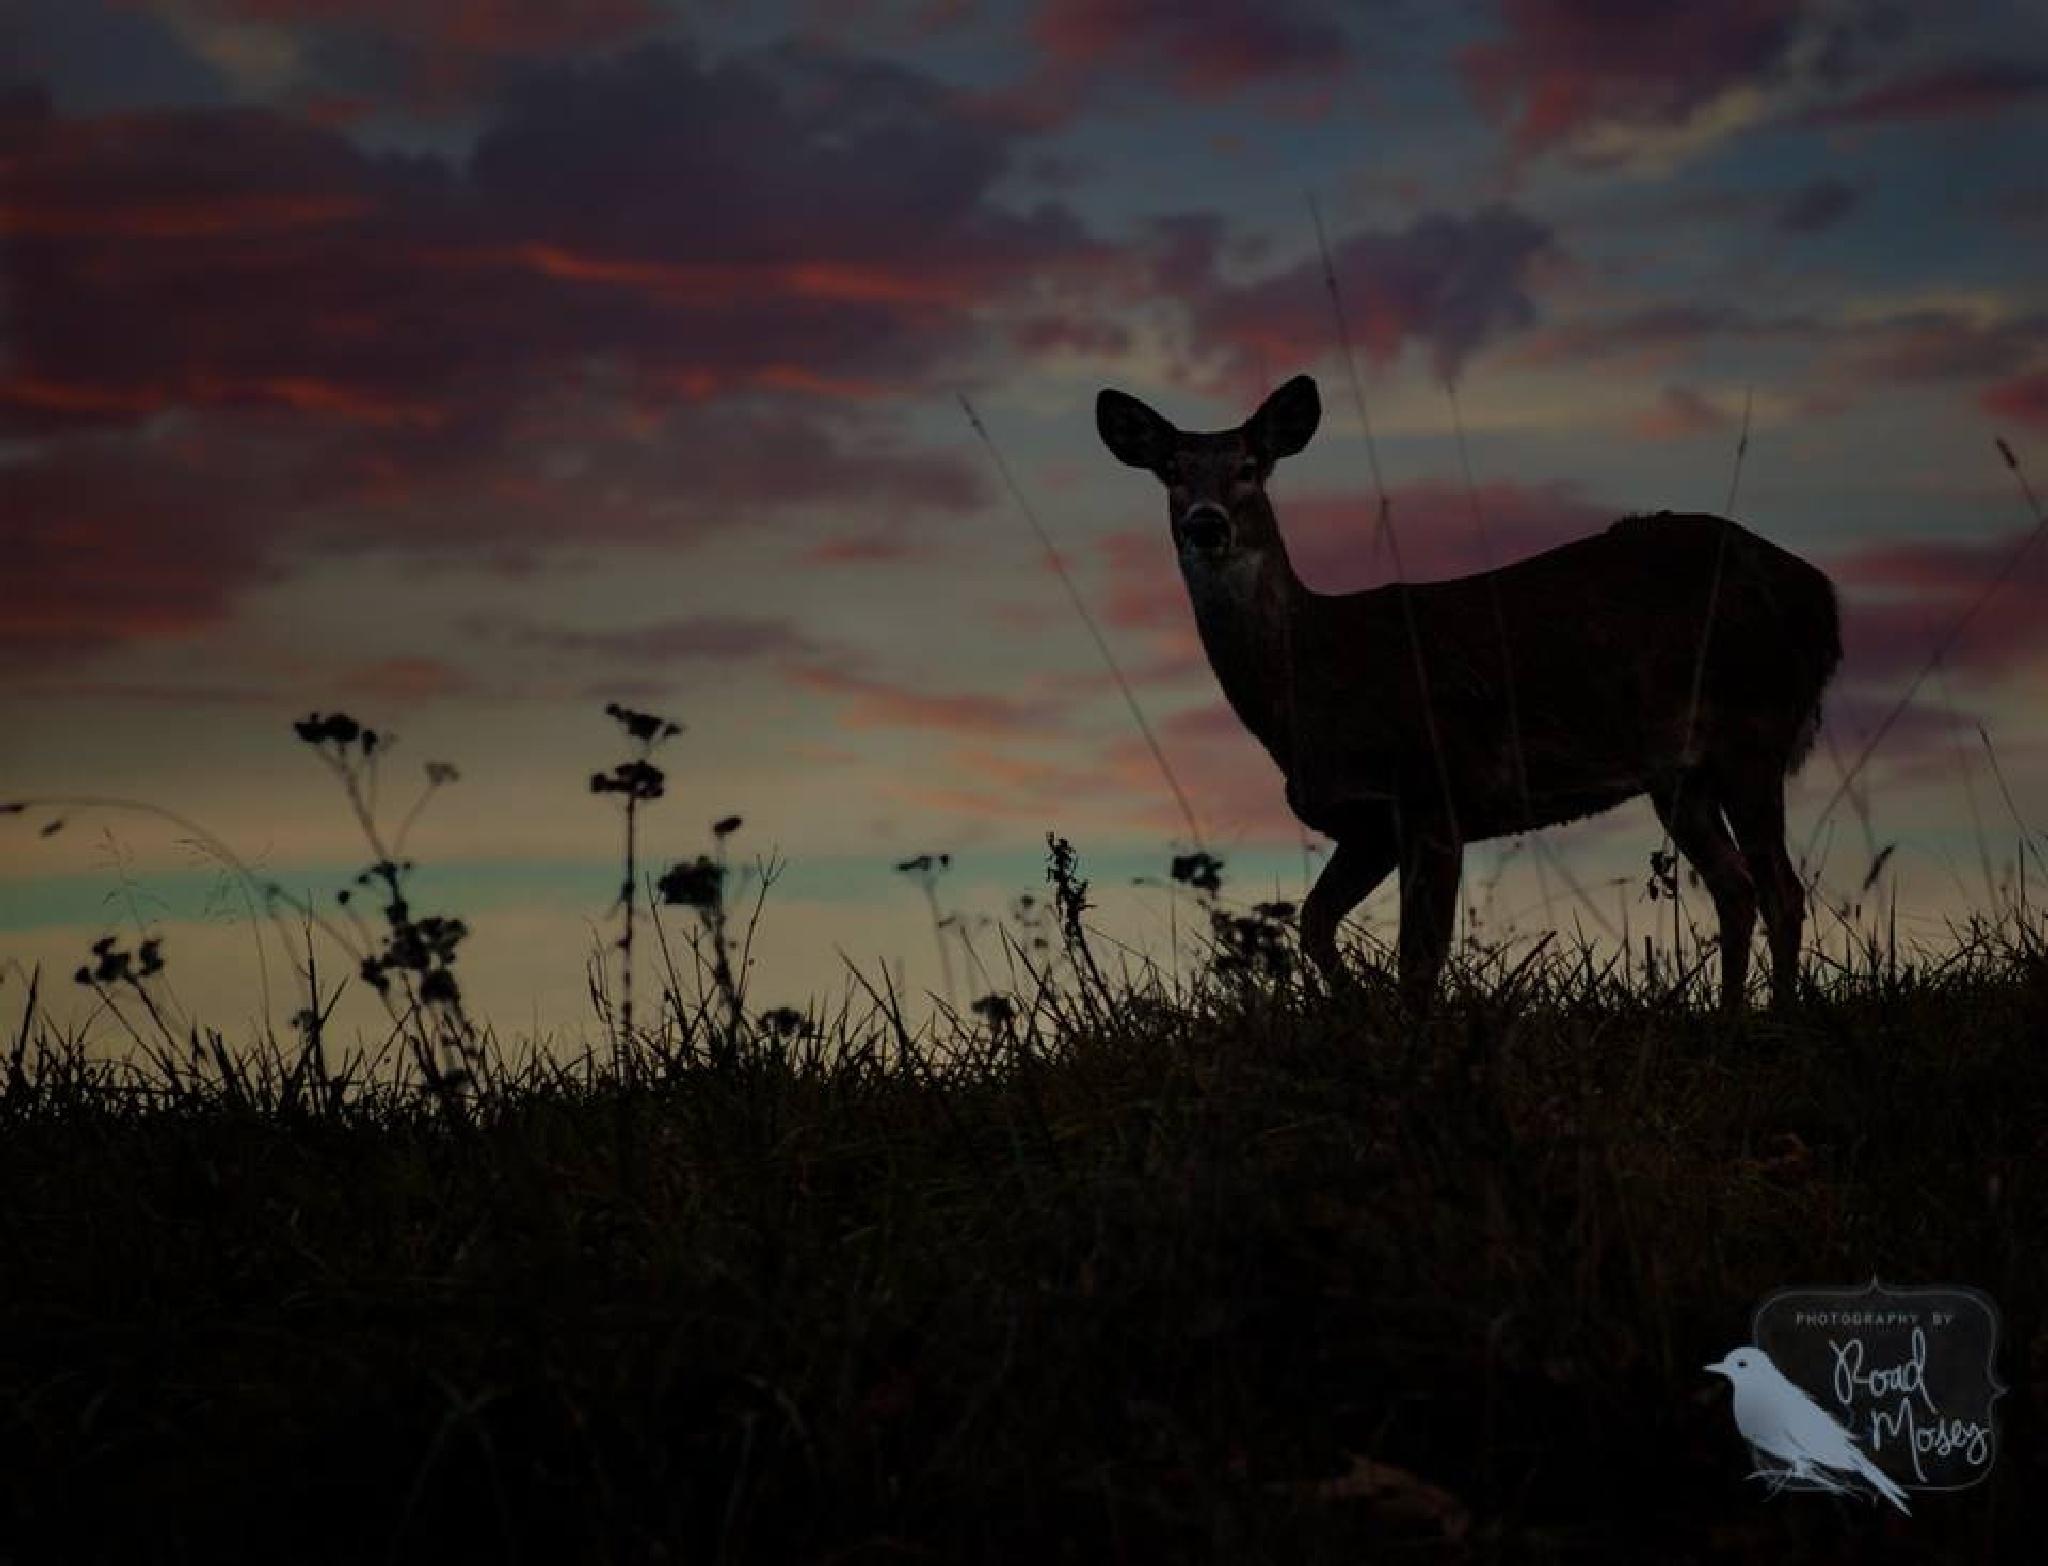 West Virginia Nightlife by Road Mosey Photography - Robin Brandjes